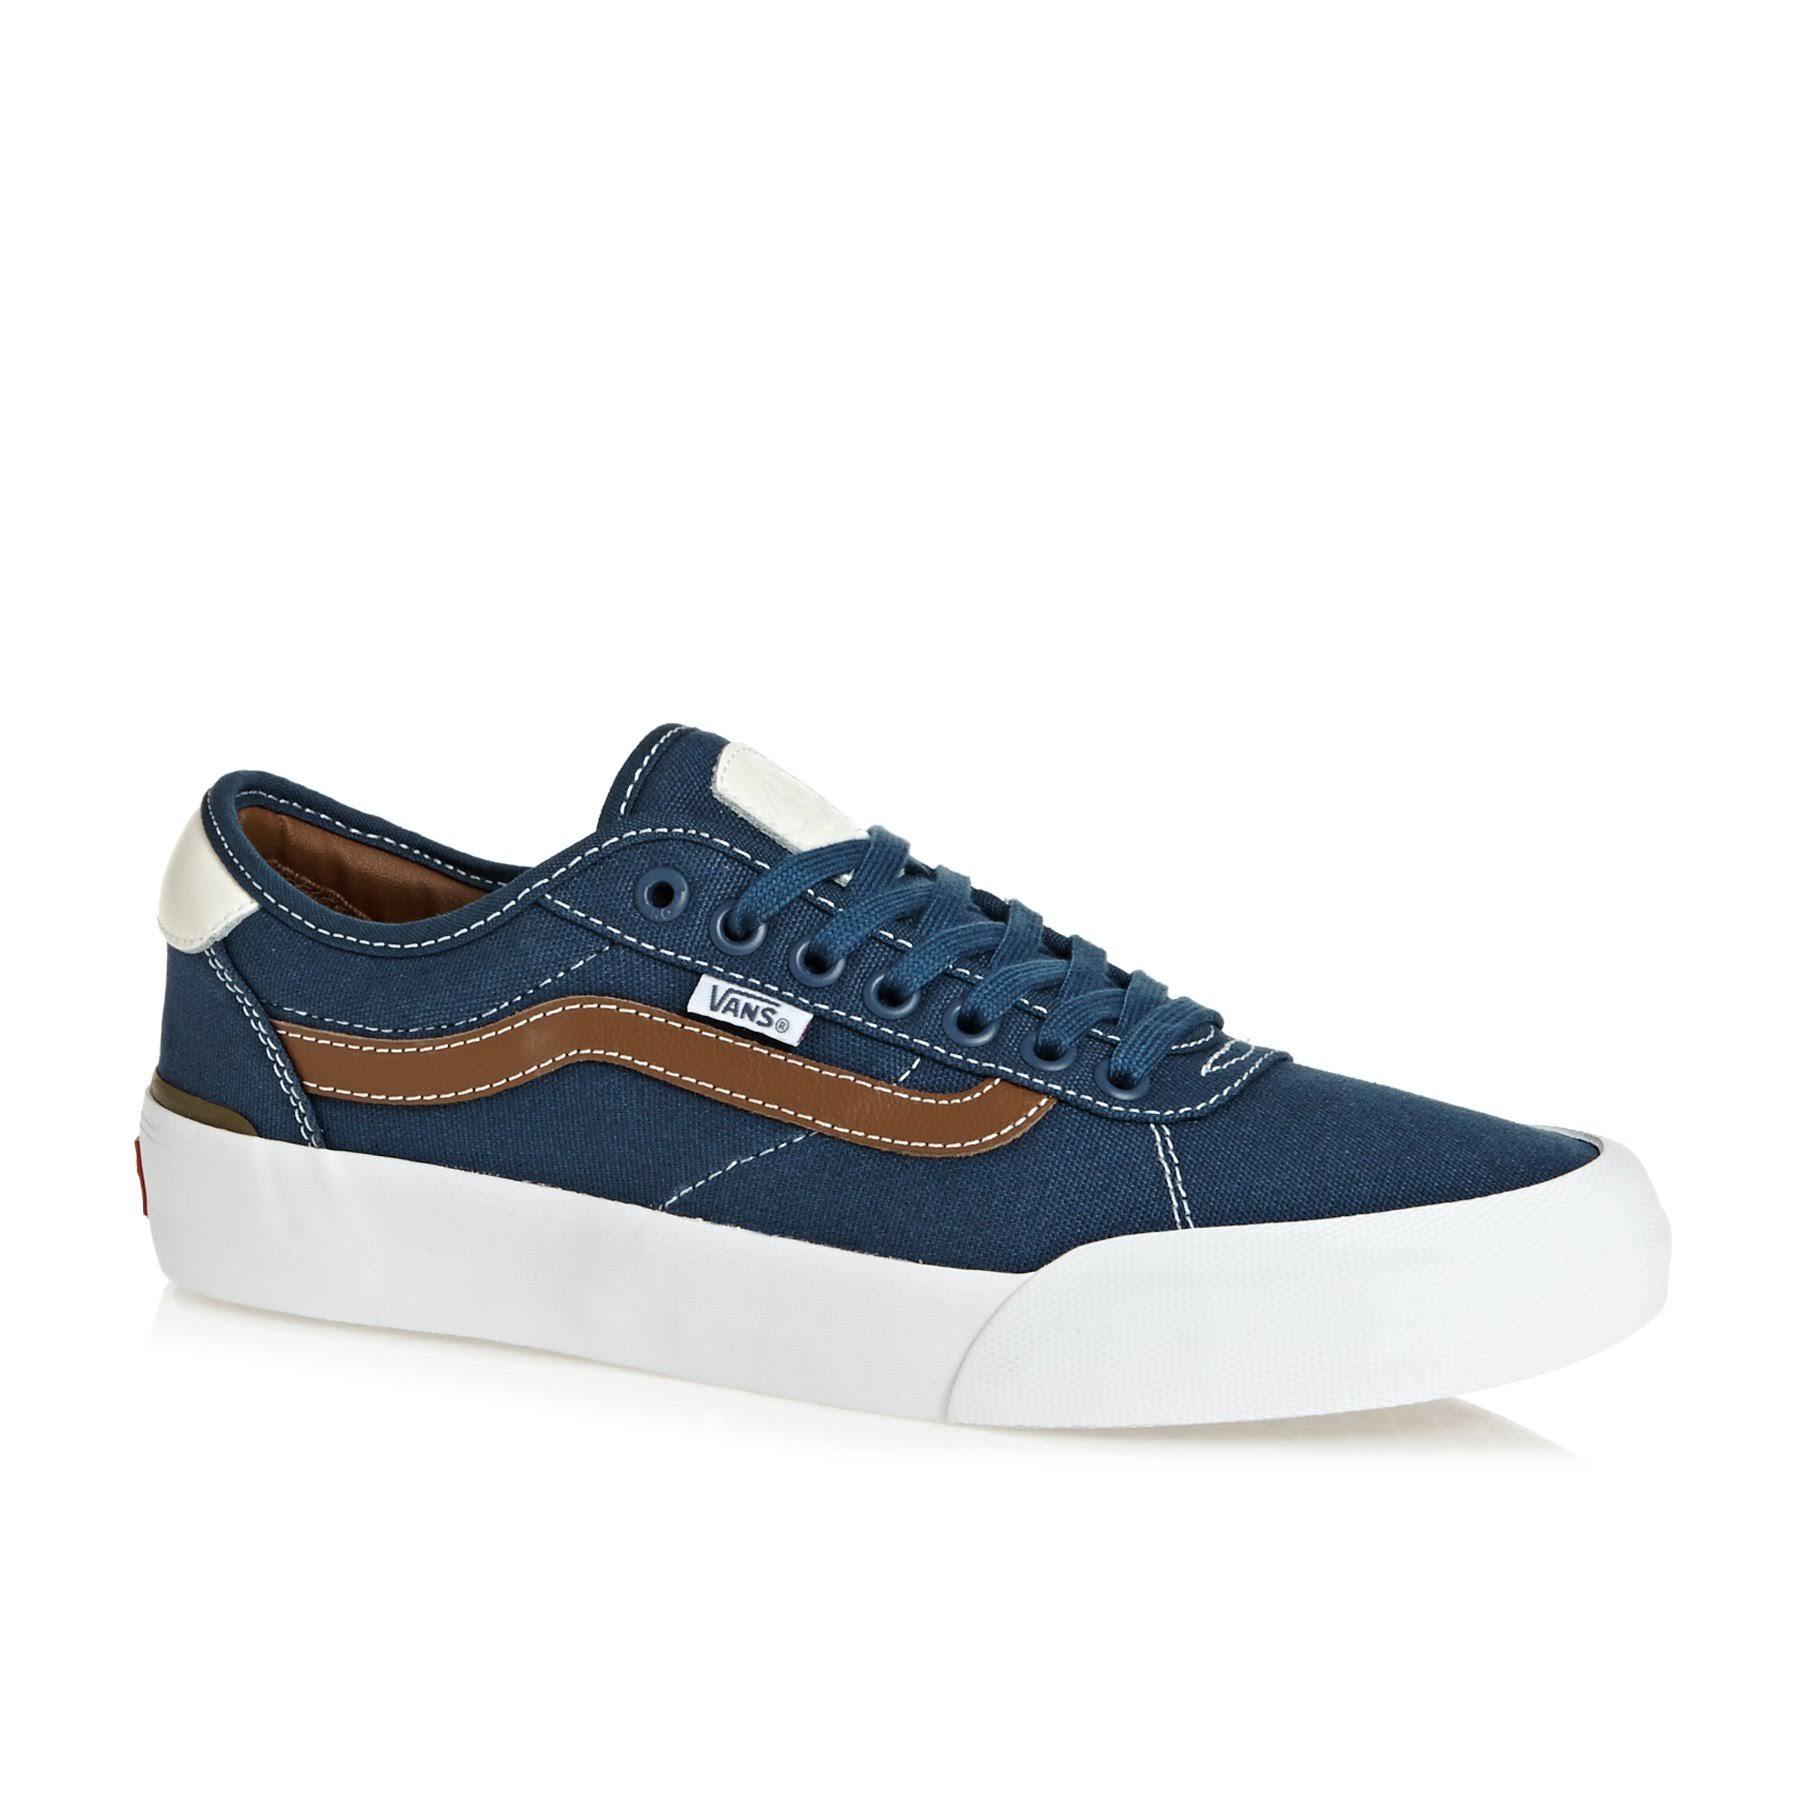 Dark Dachshund Denim Shoes Brown Pro Vans 2 navy Chima 7SYIwqp